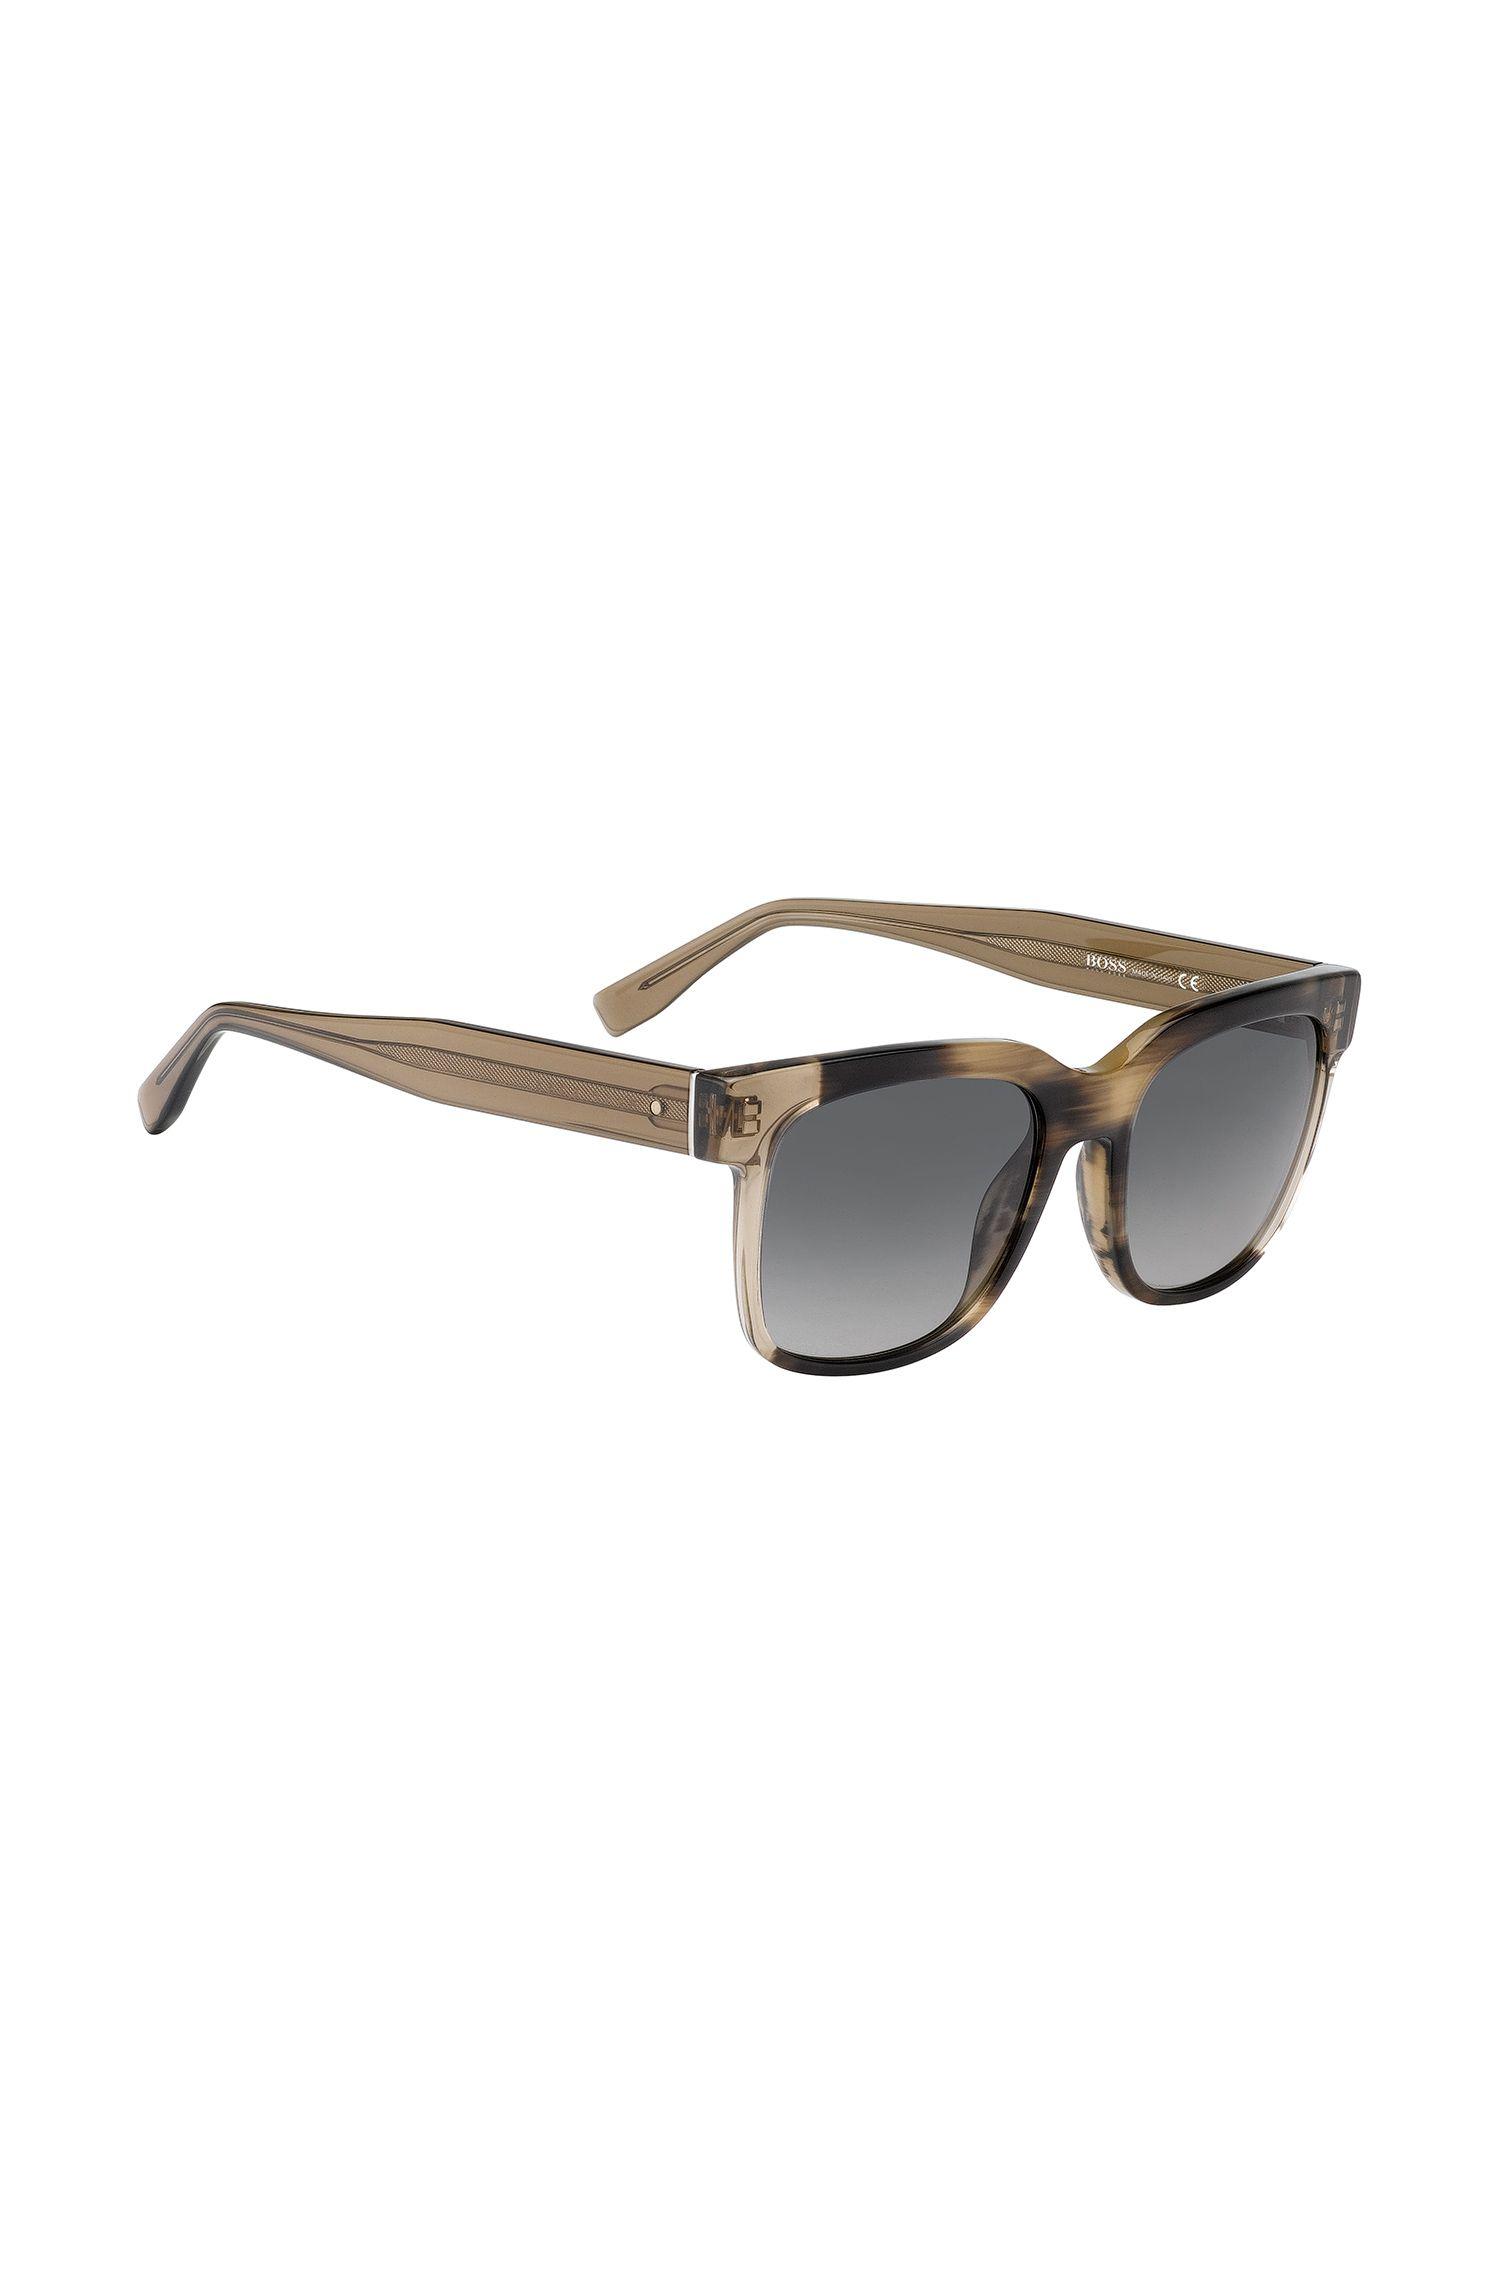 Sunglasses: 'BOSS 0735/S'